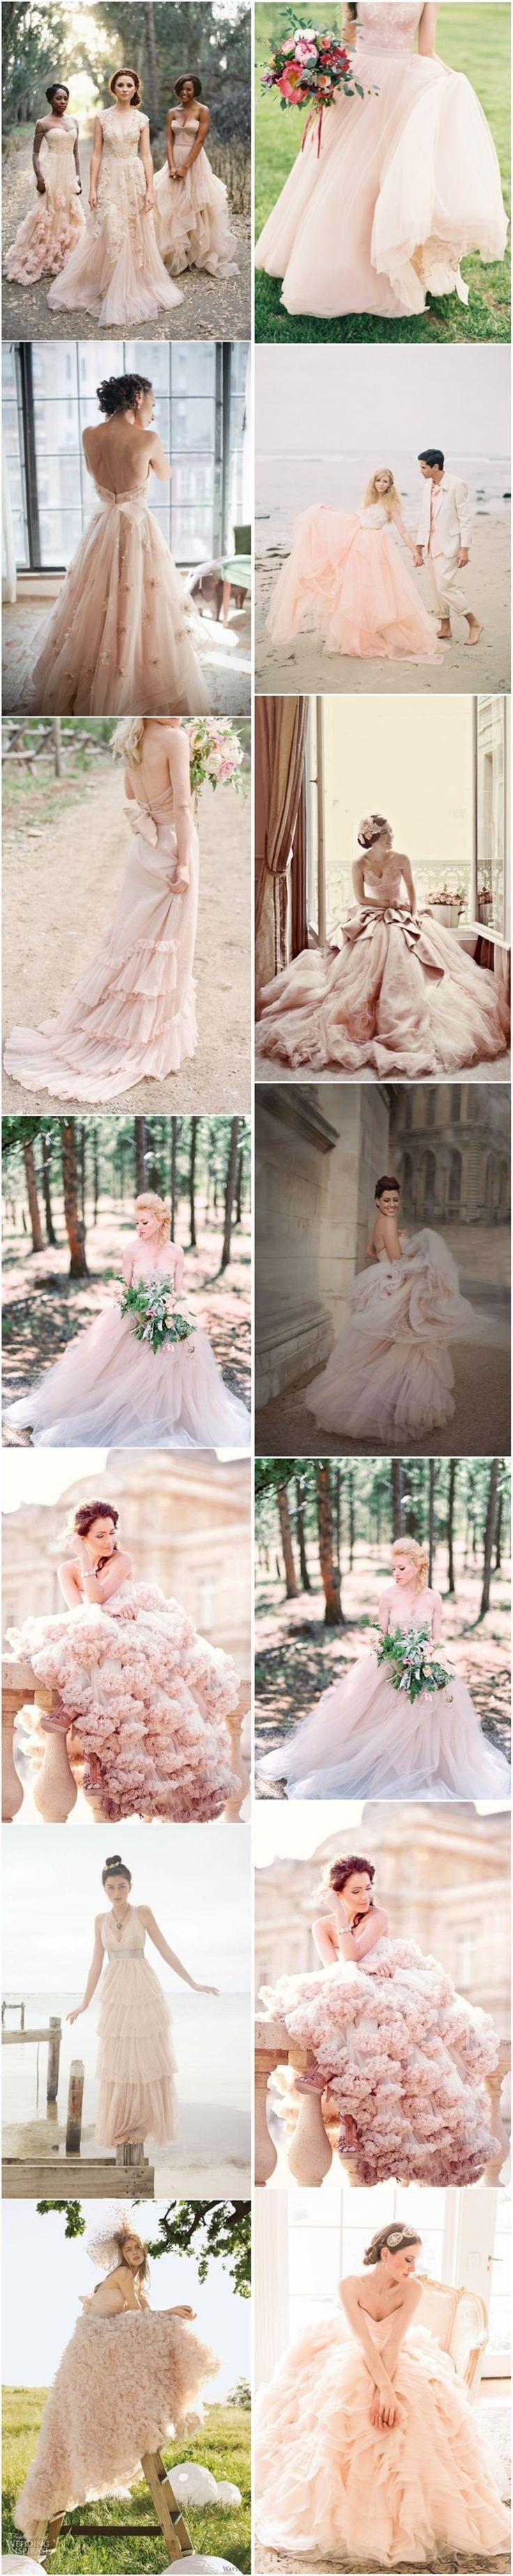 Wedding - 15 Sweet Peach & Blush Wedding Dresses